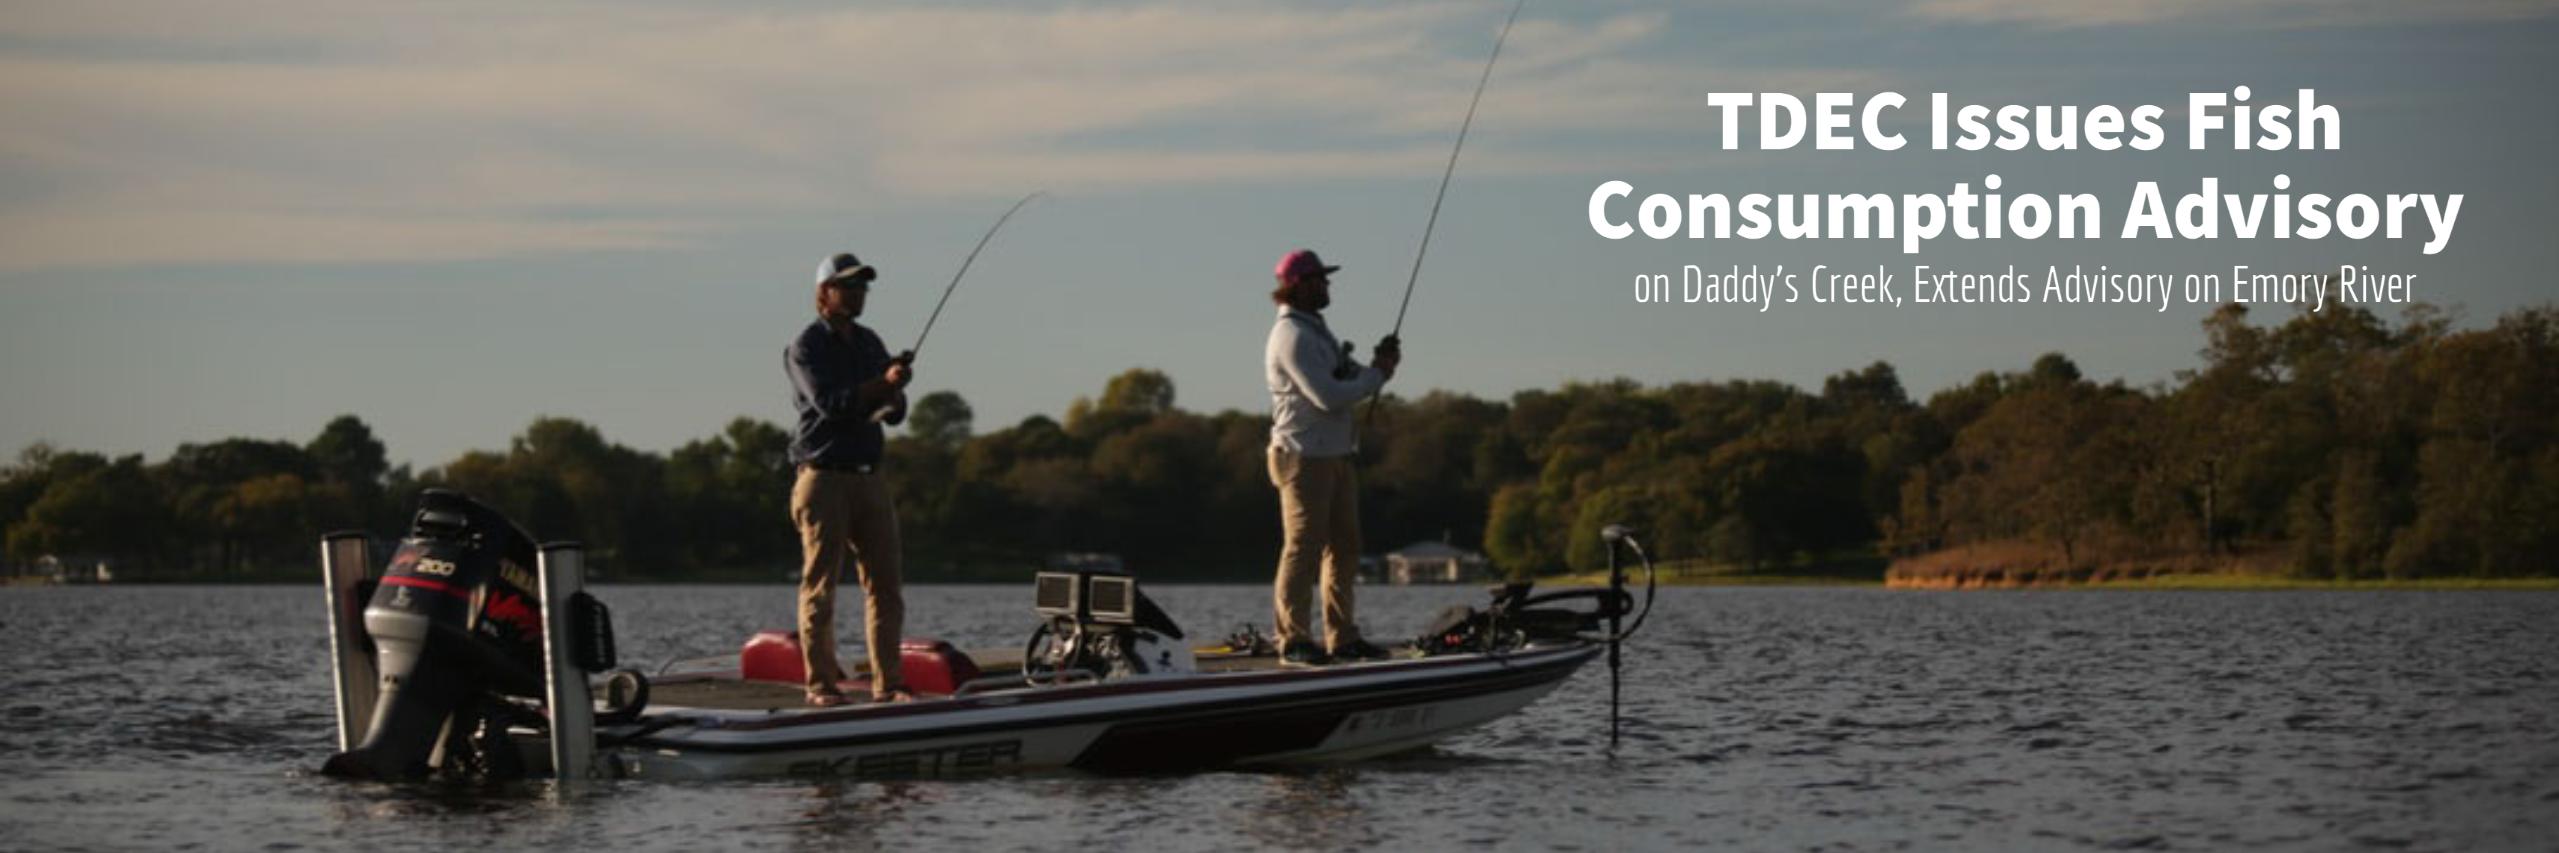 TDEC Issues Precautionary Fish Consumption Advisory on Daddy's Creek, Extends Advisory on Emory River